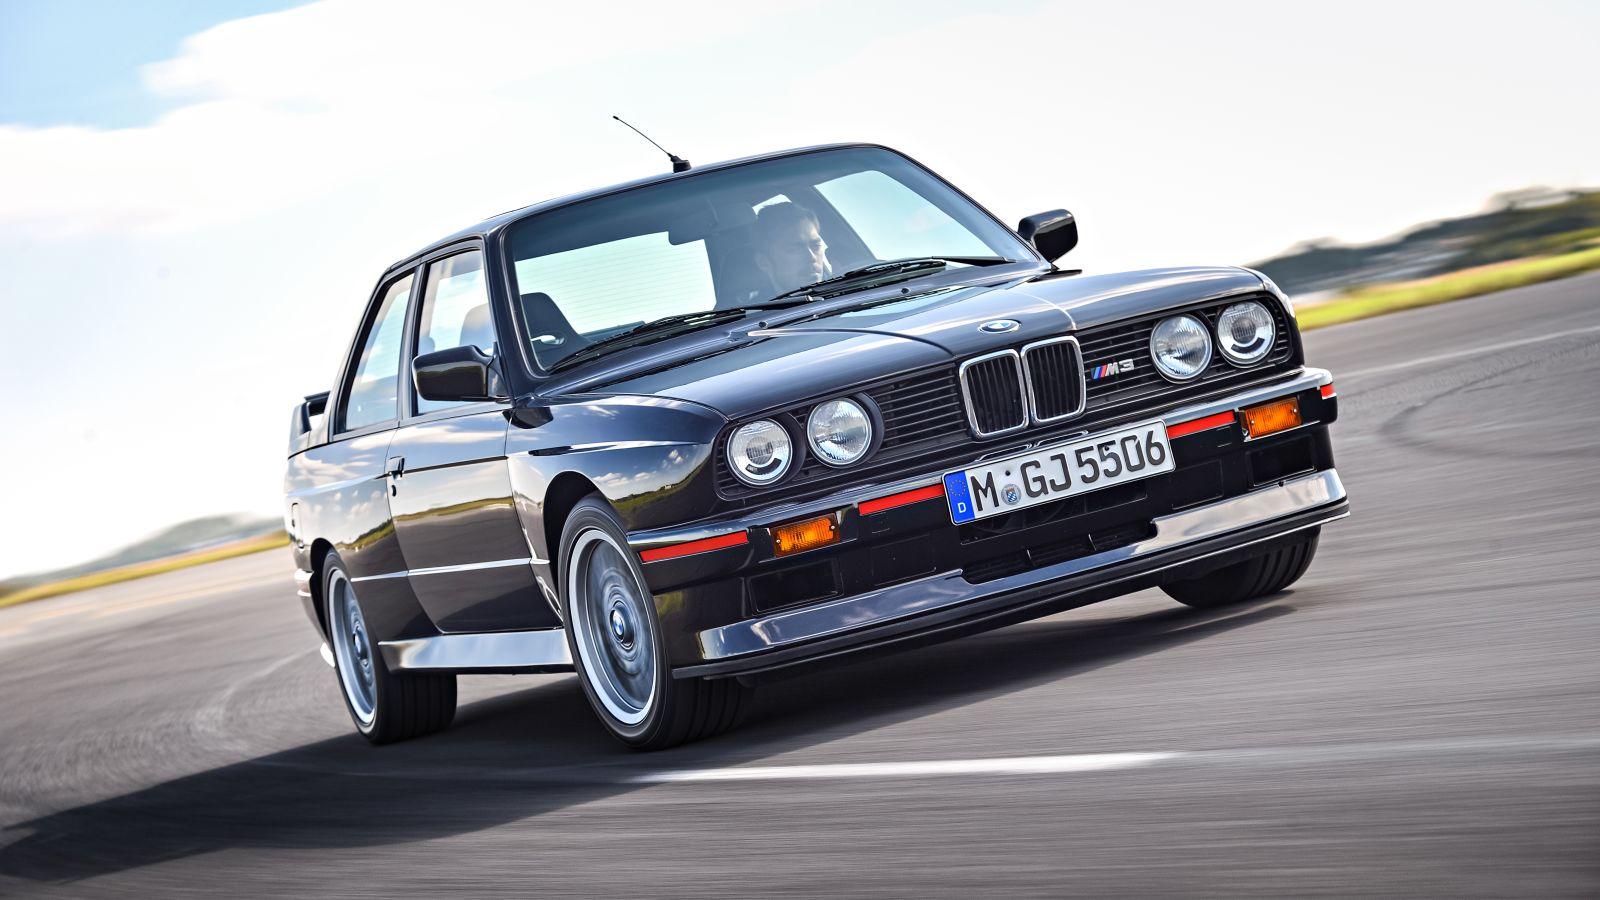 BMW M3 (E30) - En Özel BMW M Otomobilleri Listesi